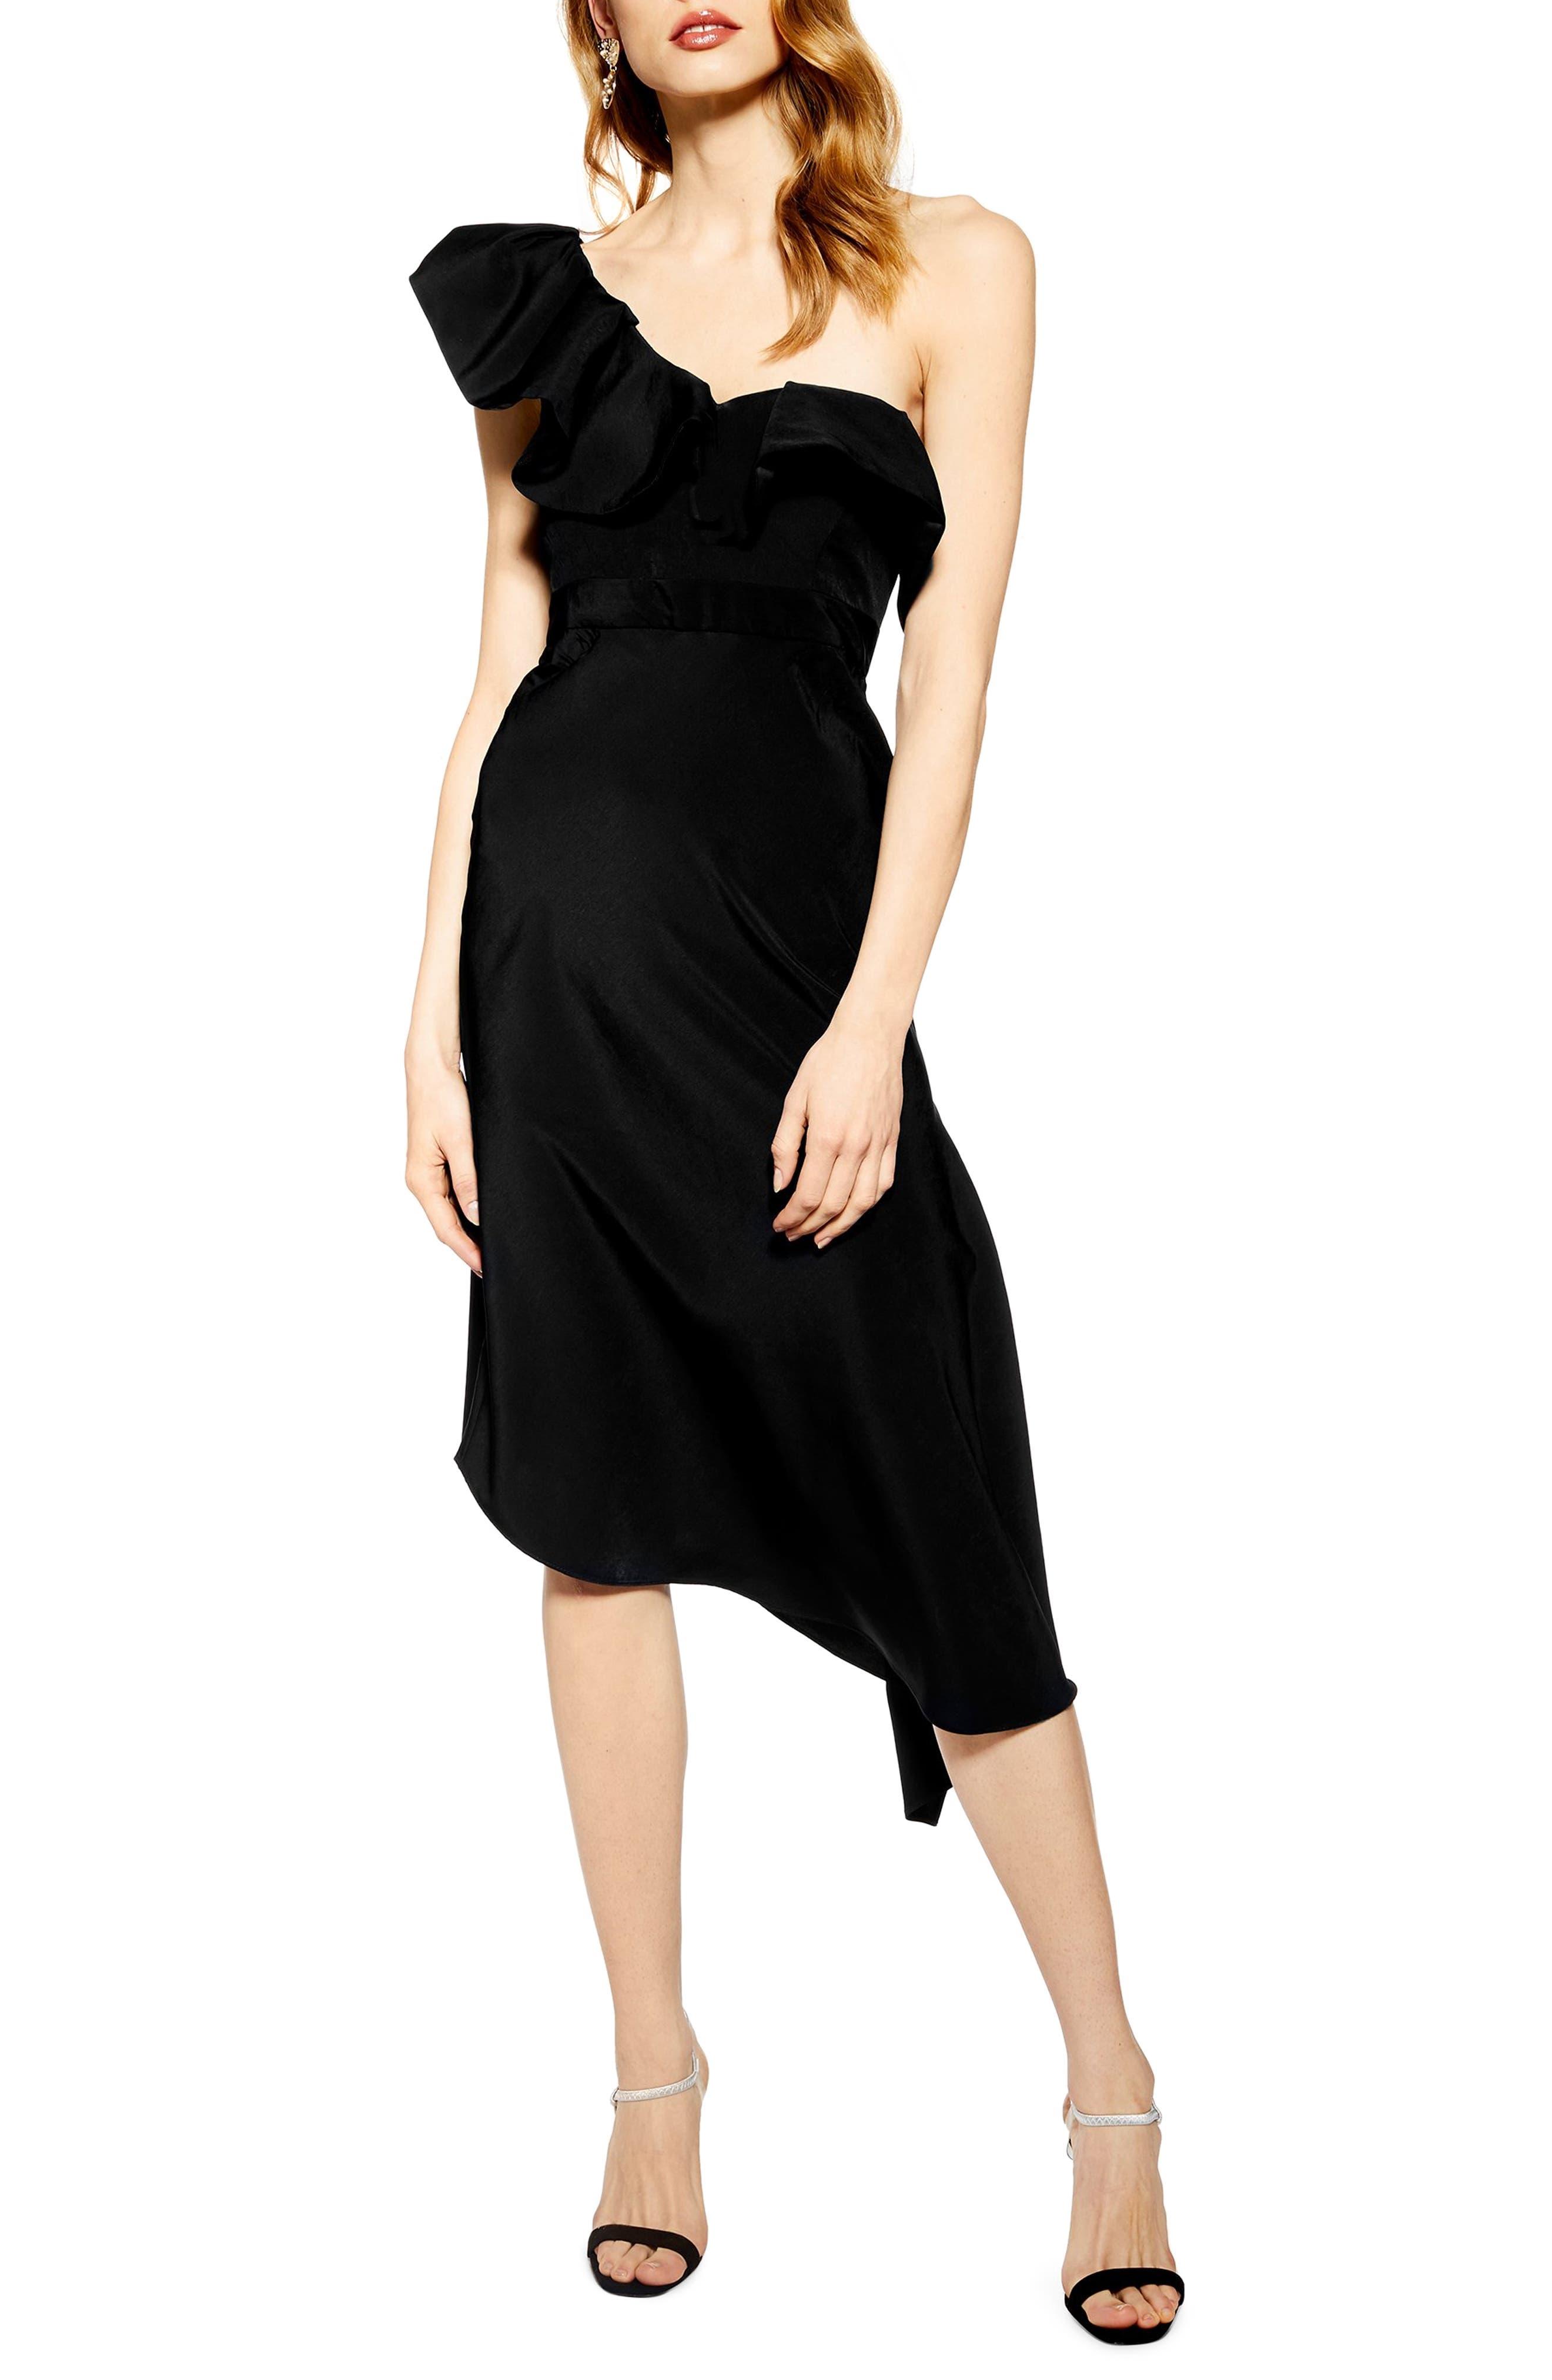 Promo Code Topshop Ruffle One Shoulder Midi Dress